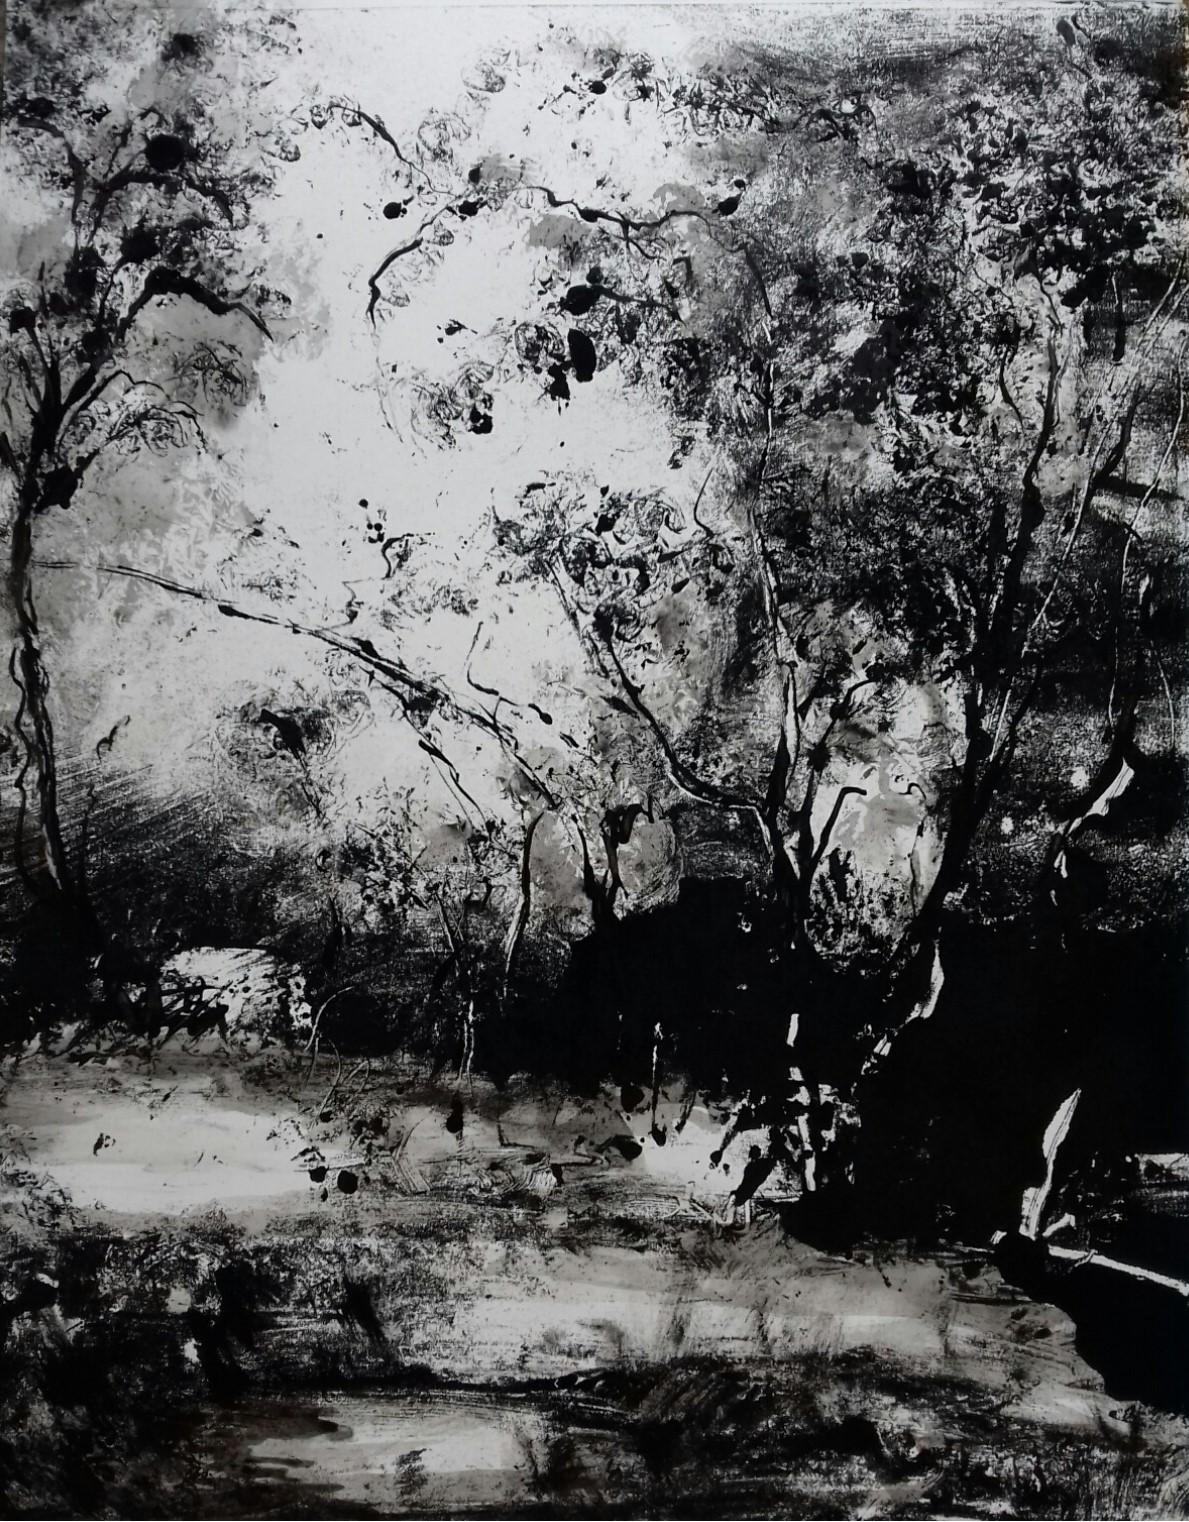 Monotype encre, 50x70 cm, 2017